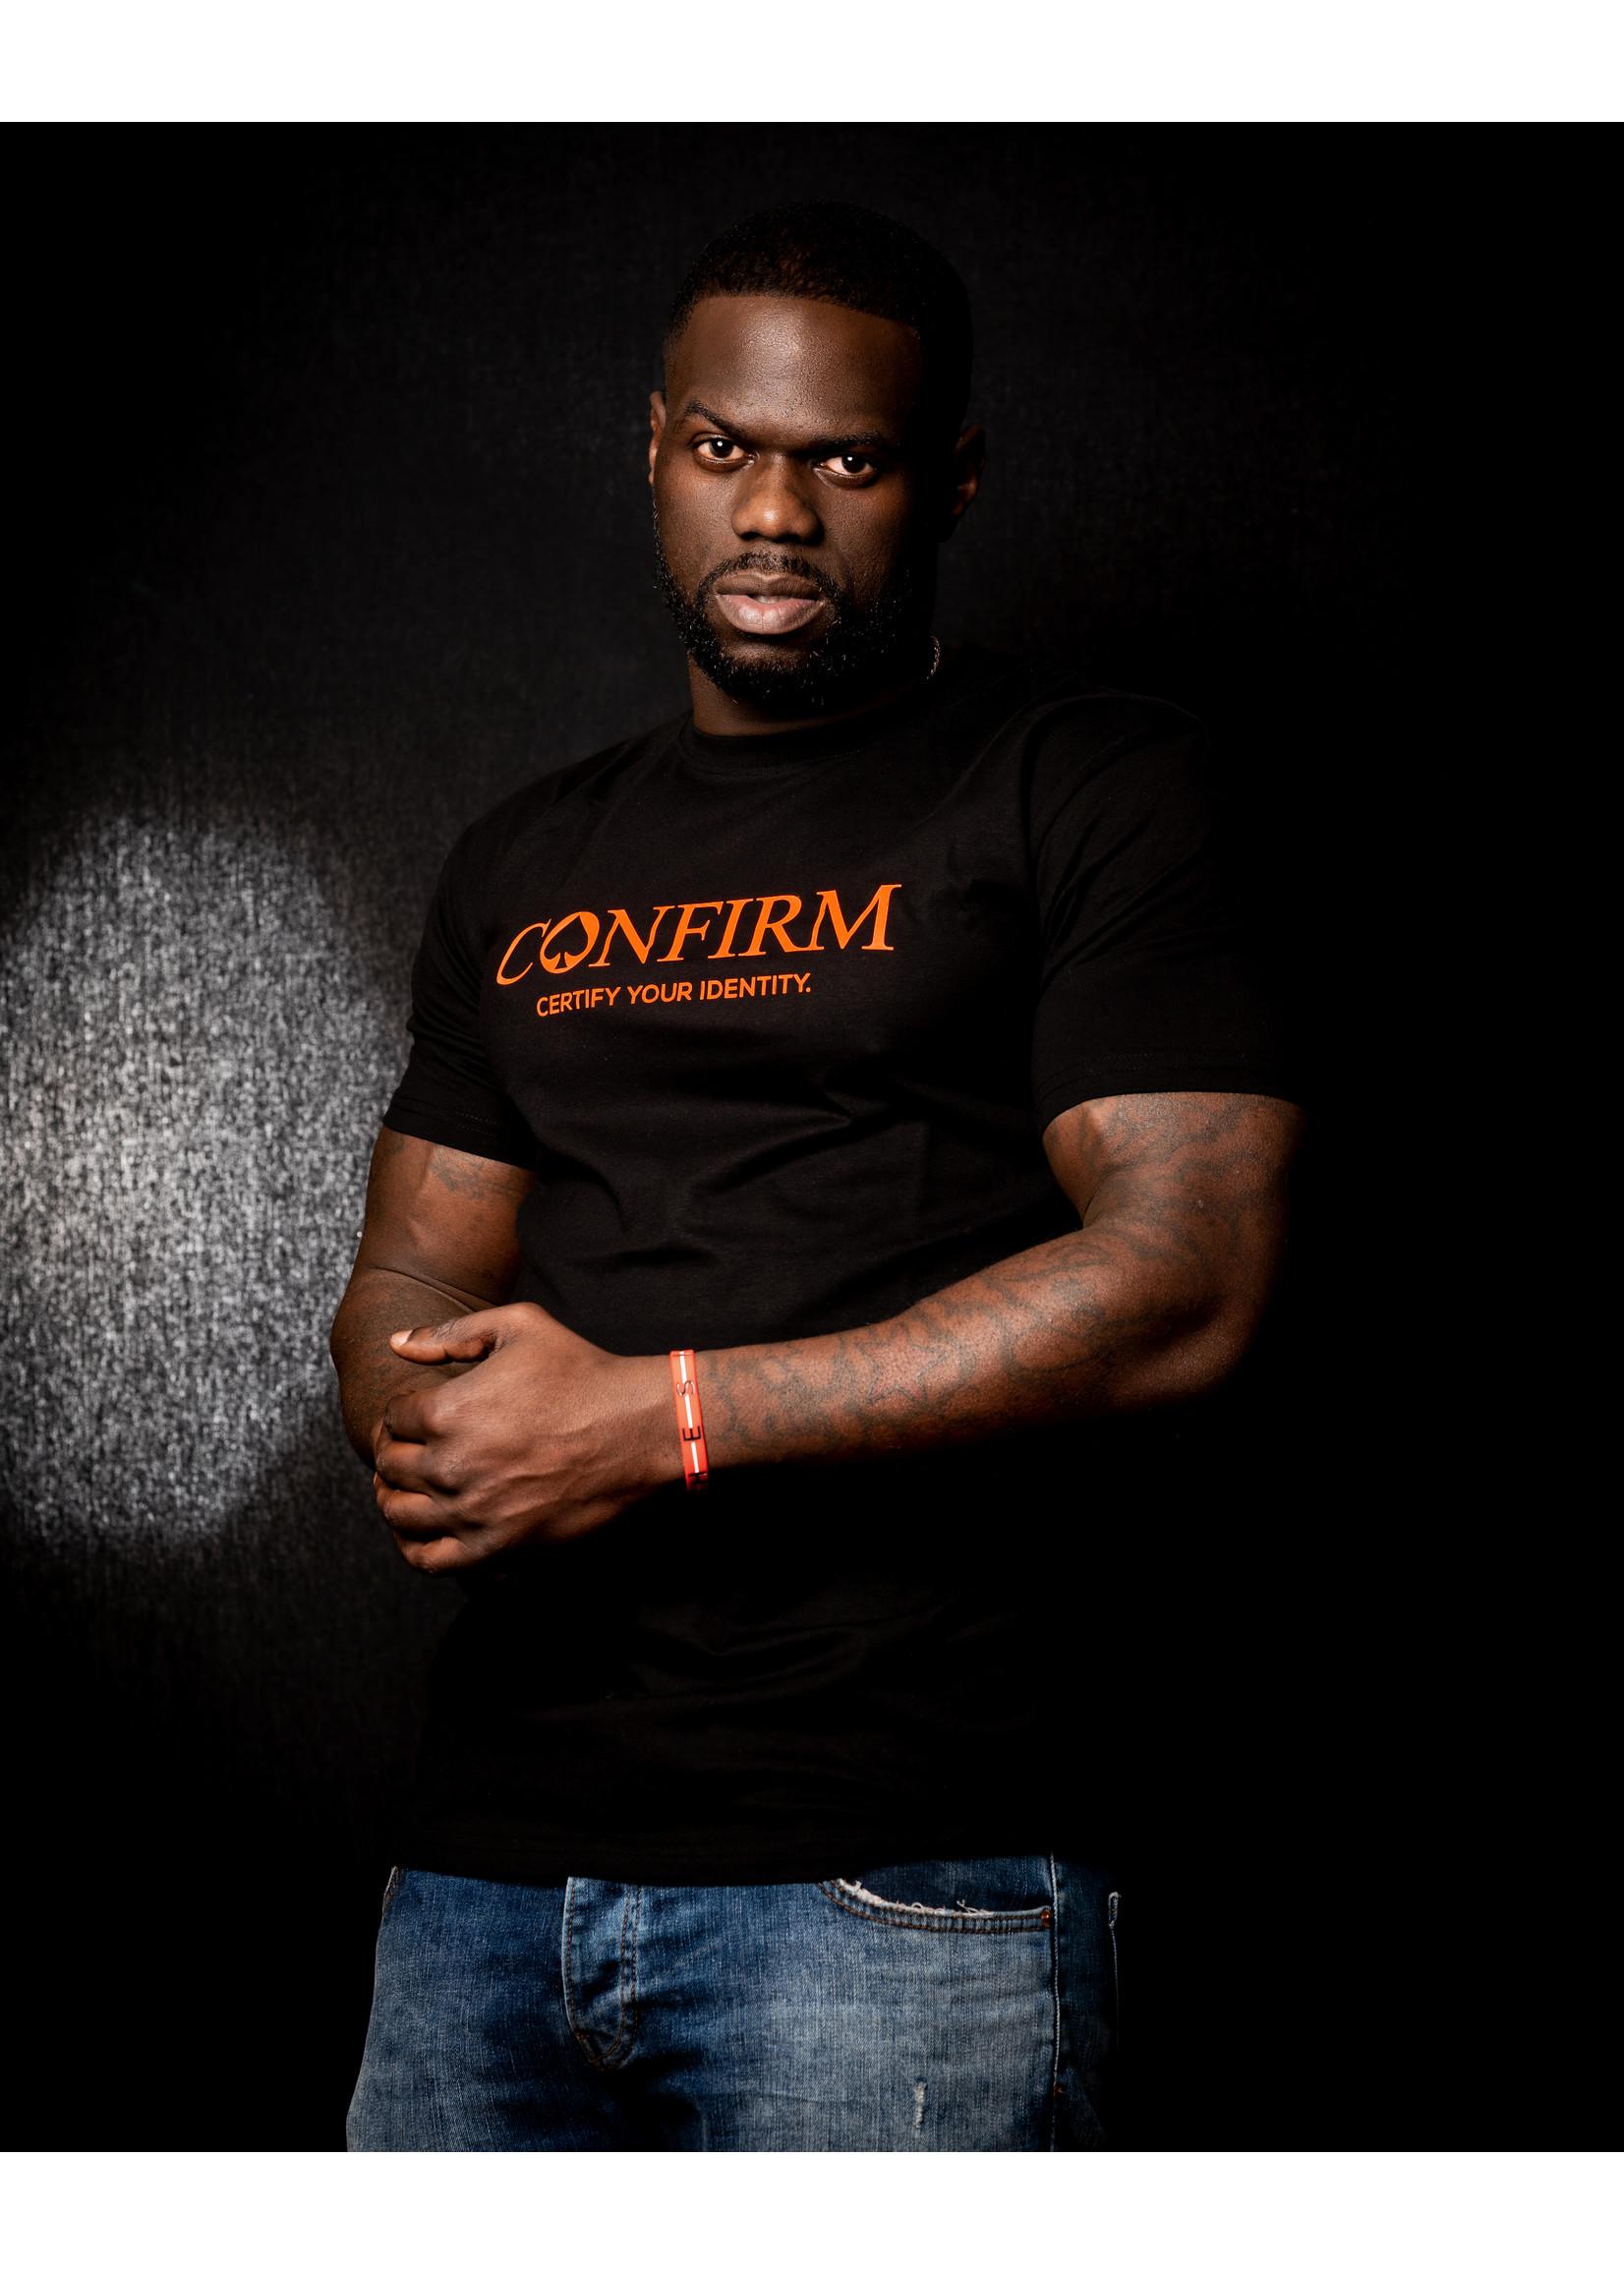 Confirm brand T-shirt identity - neon orange